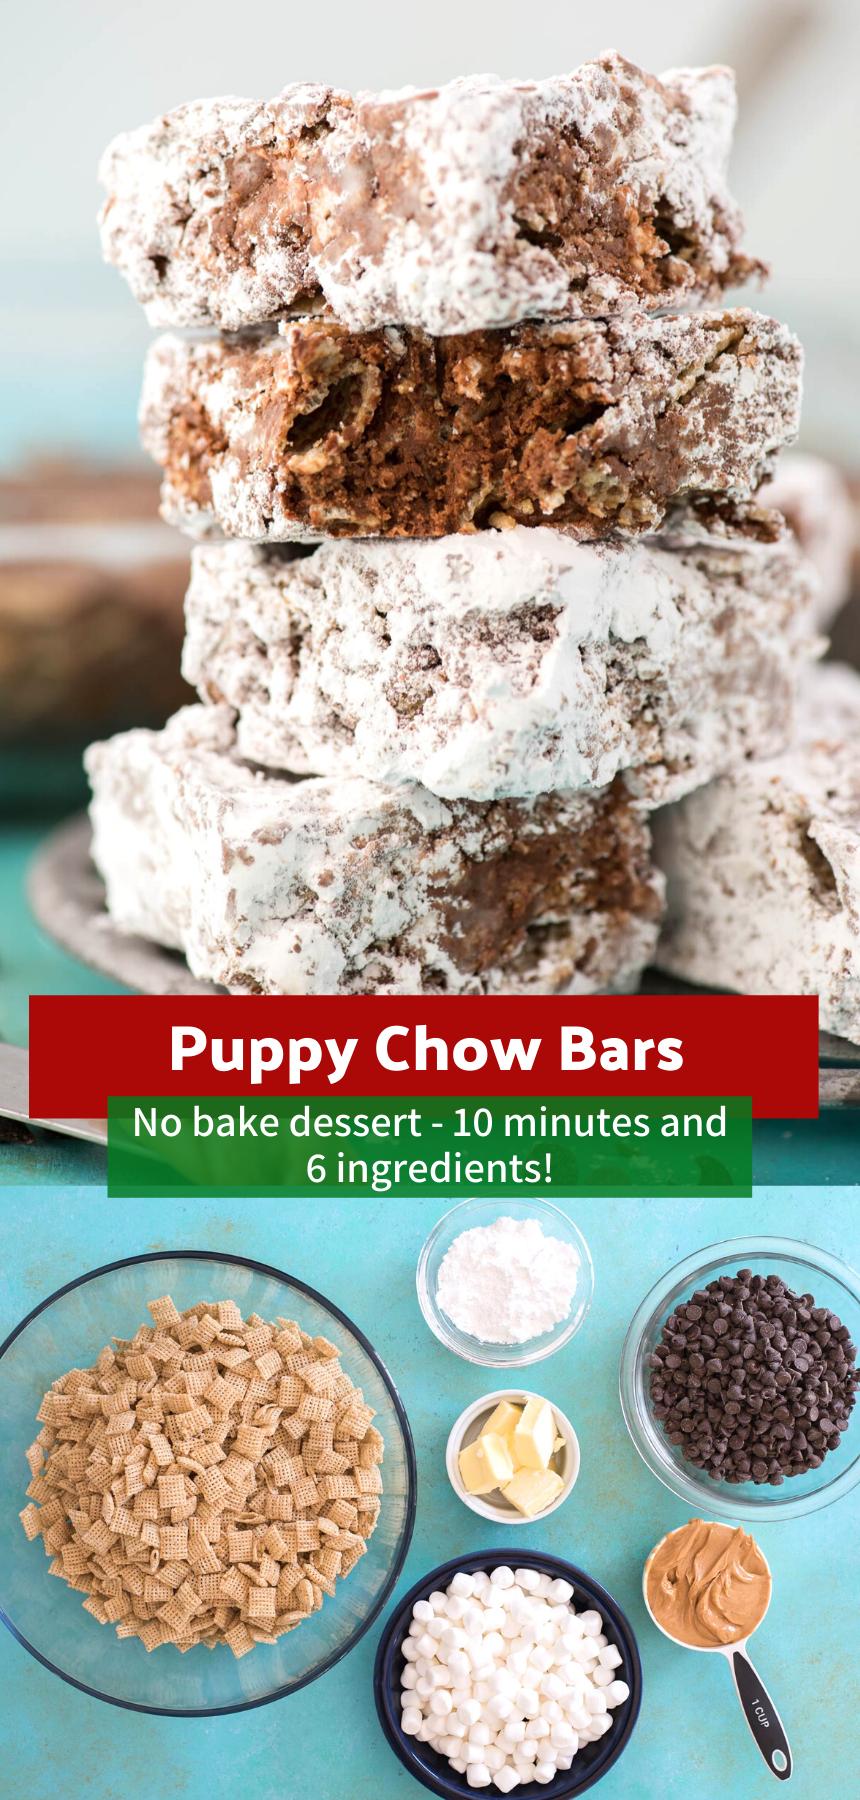 Peanut Butter Puppy Chow A K A Pigeon Chow Recipe Puppy Chow